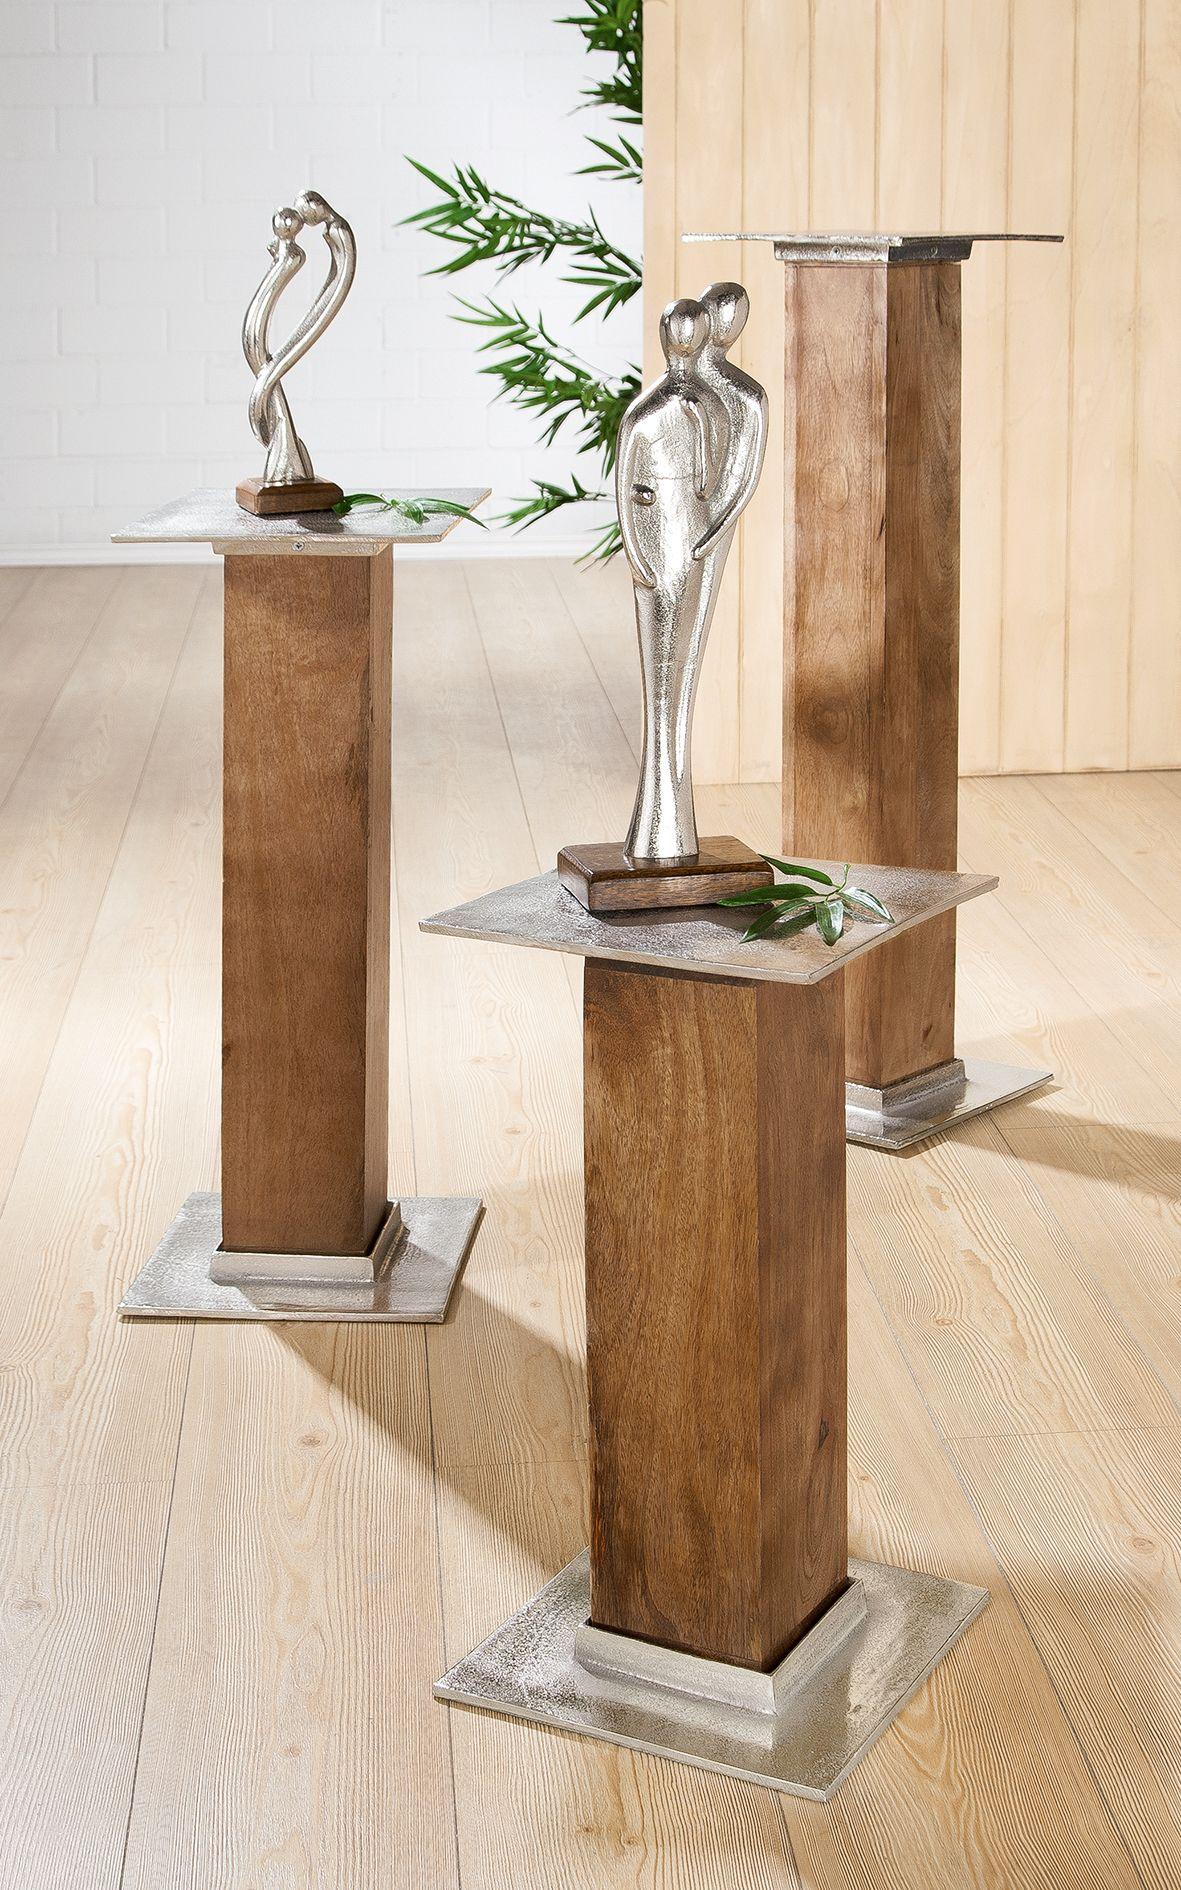 1 X Holzsaule Silber Aluminium Mangoholz Hohe 52 50 Cm Deko Haus